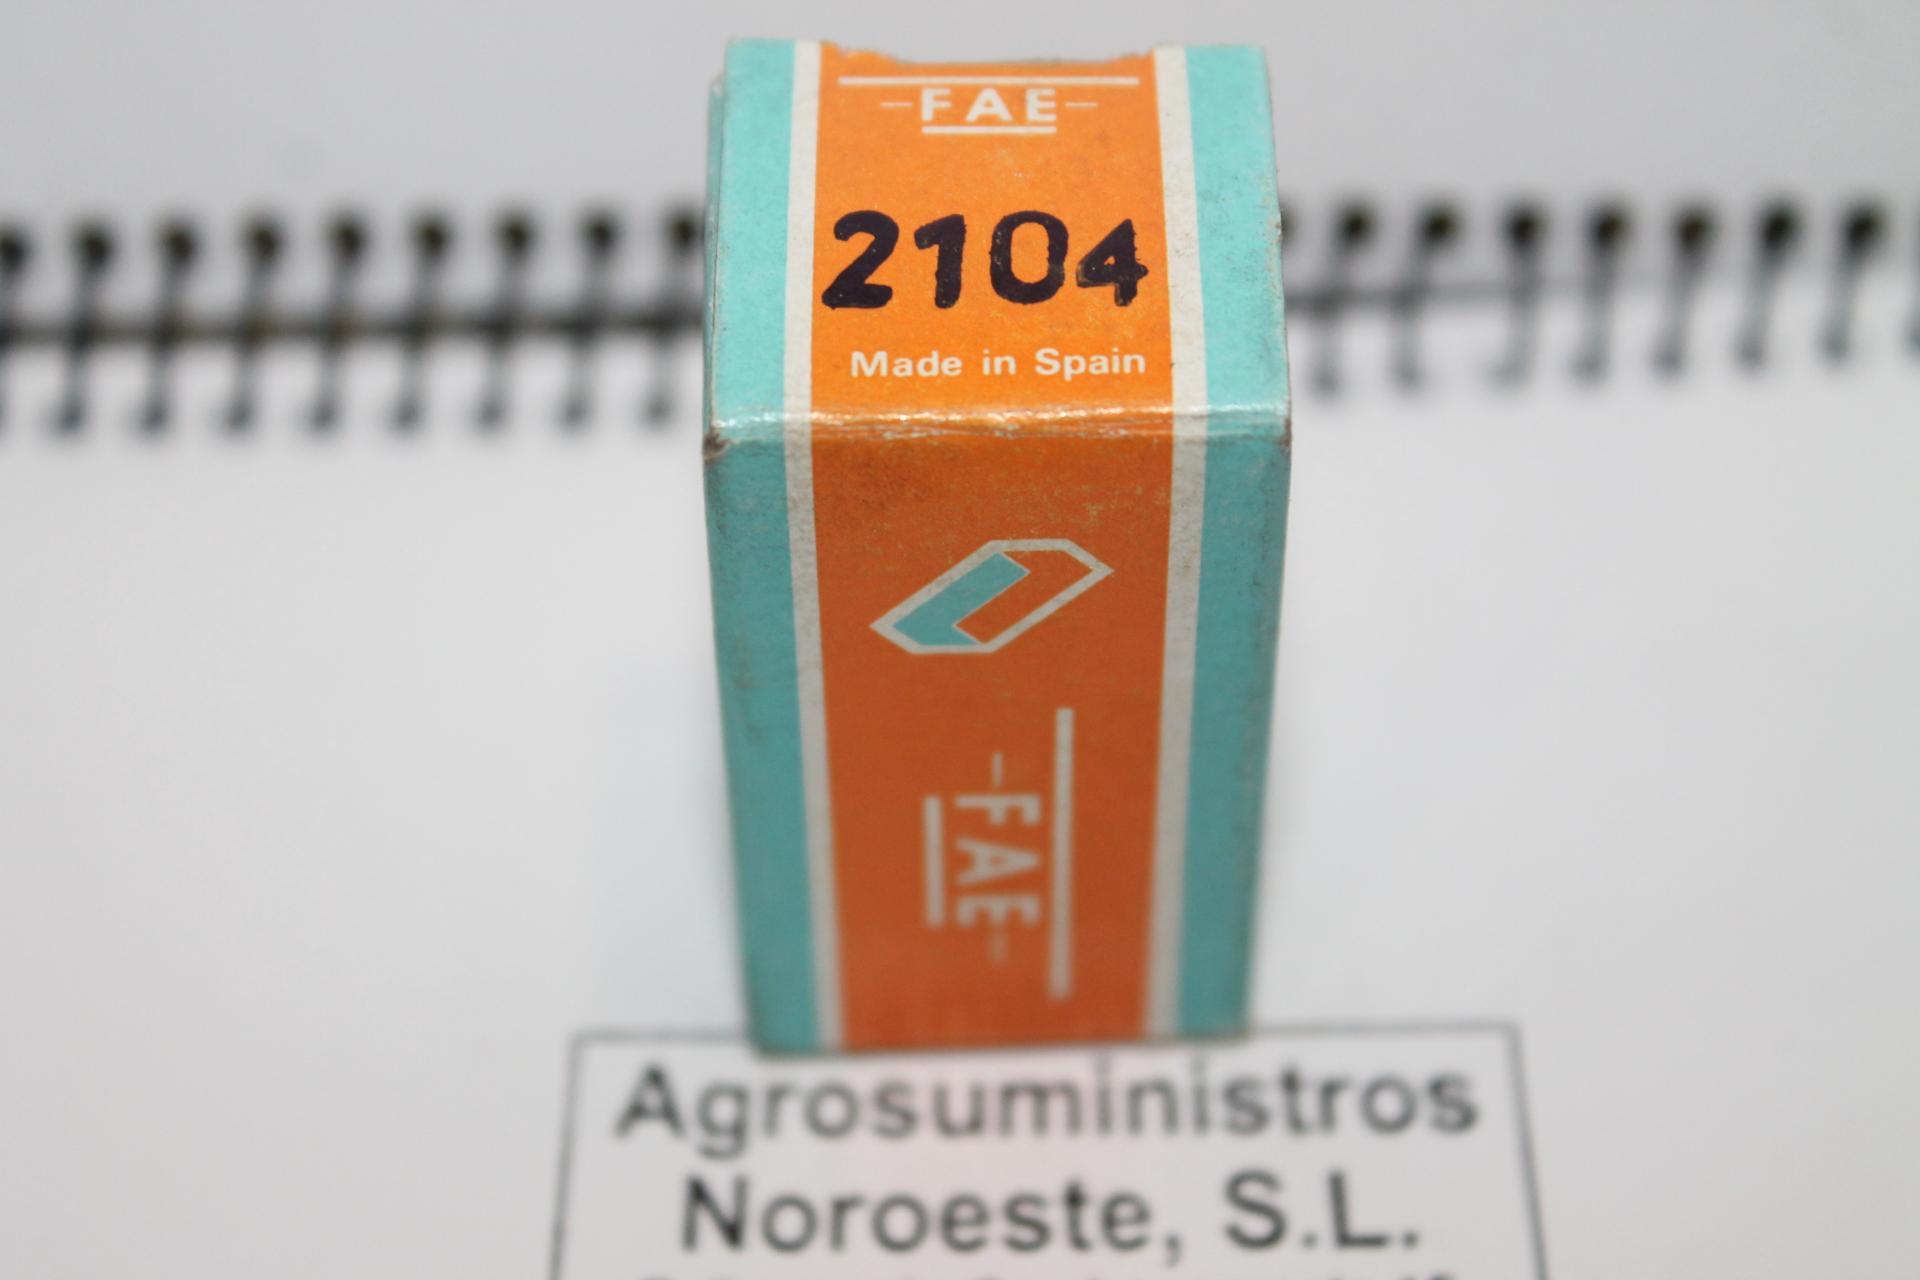 Interruptor Stop FAE 2104